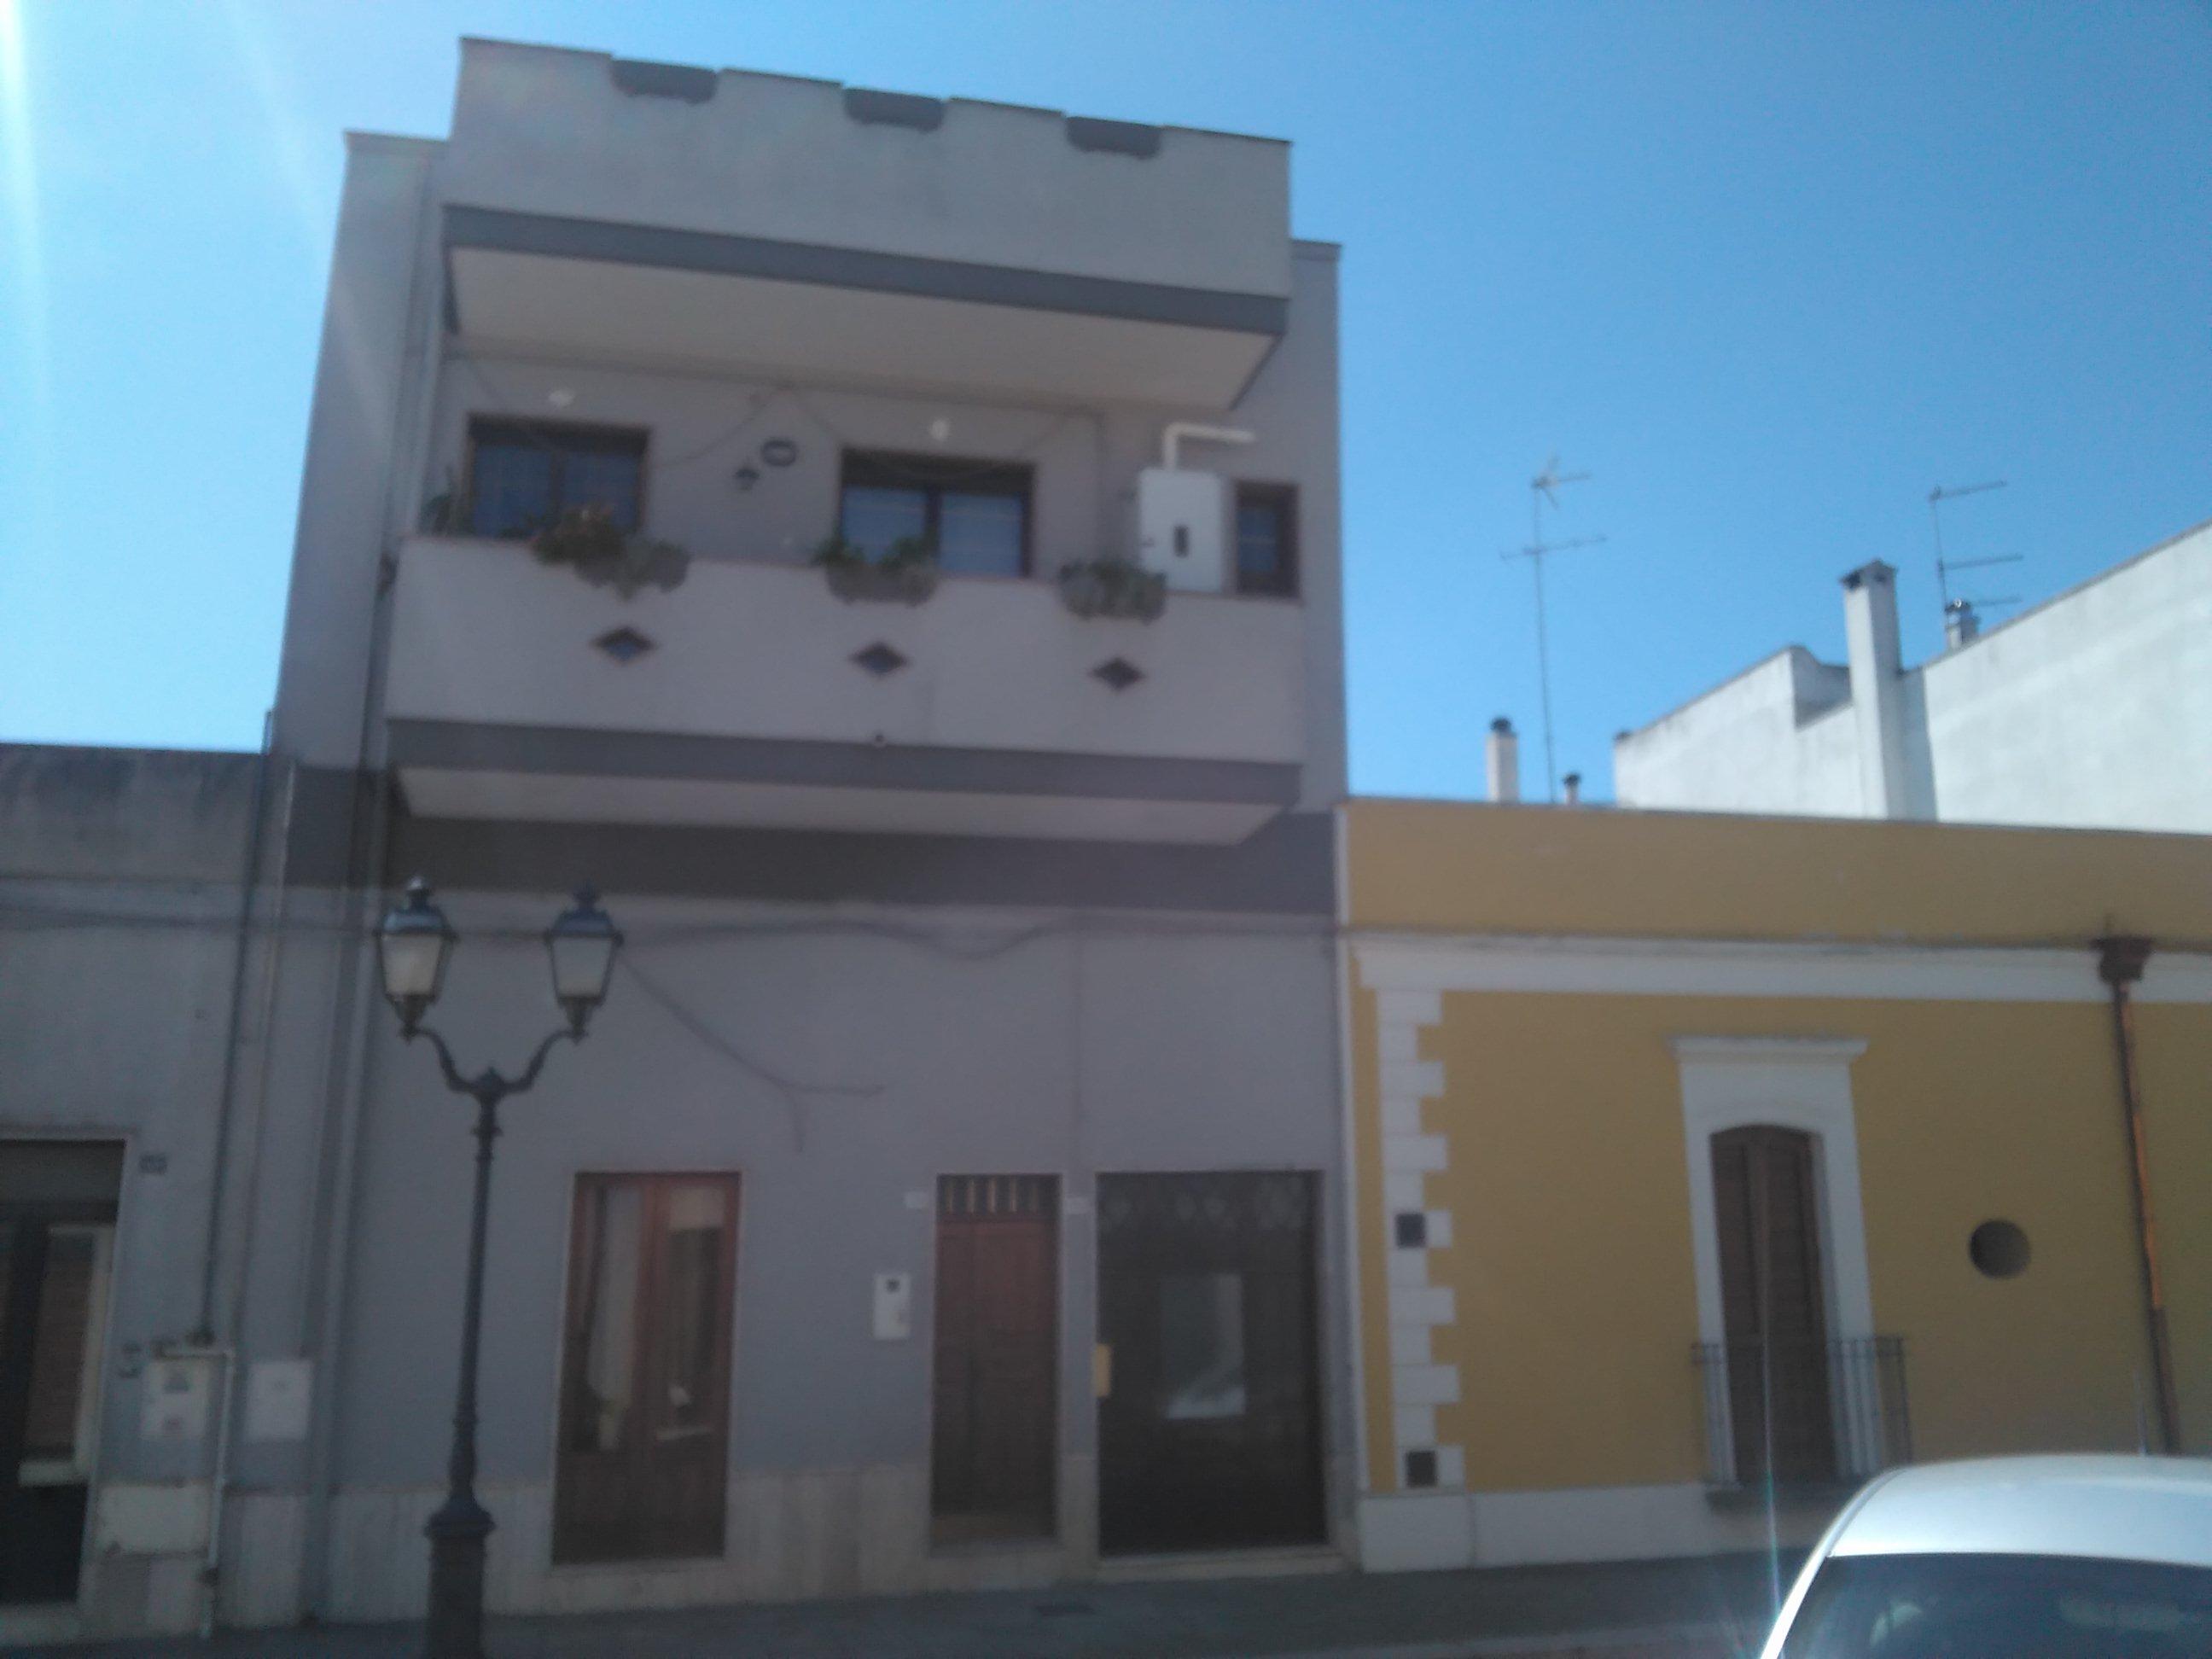 Mesagne (BR) - Via Maja Materdona, 106